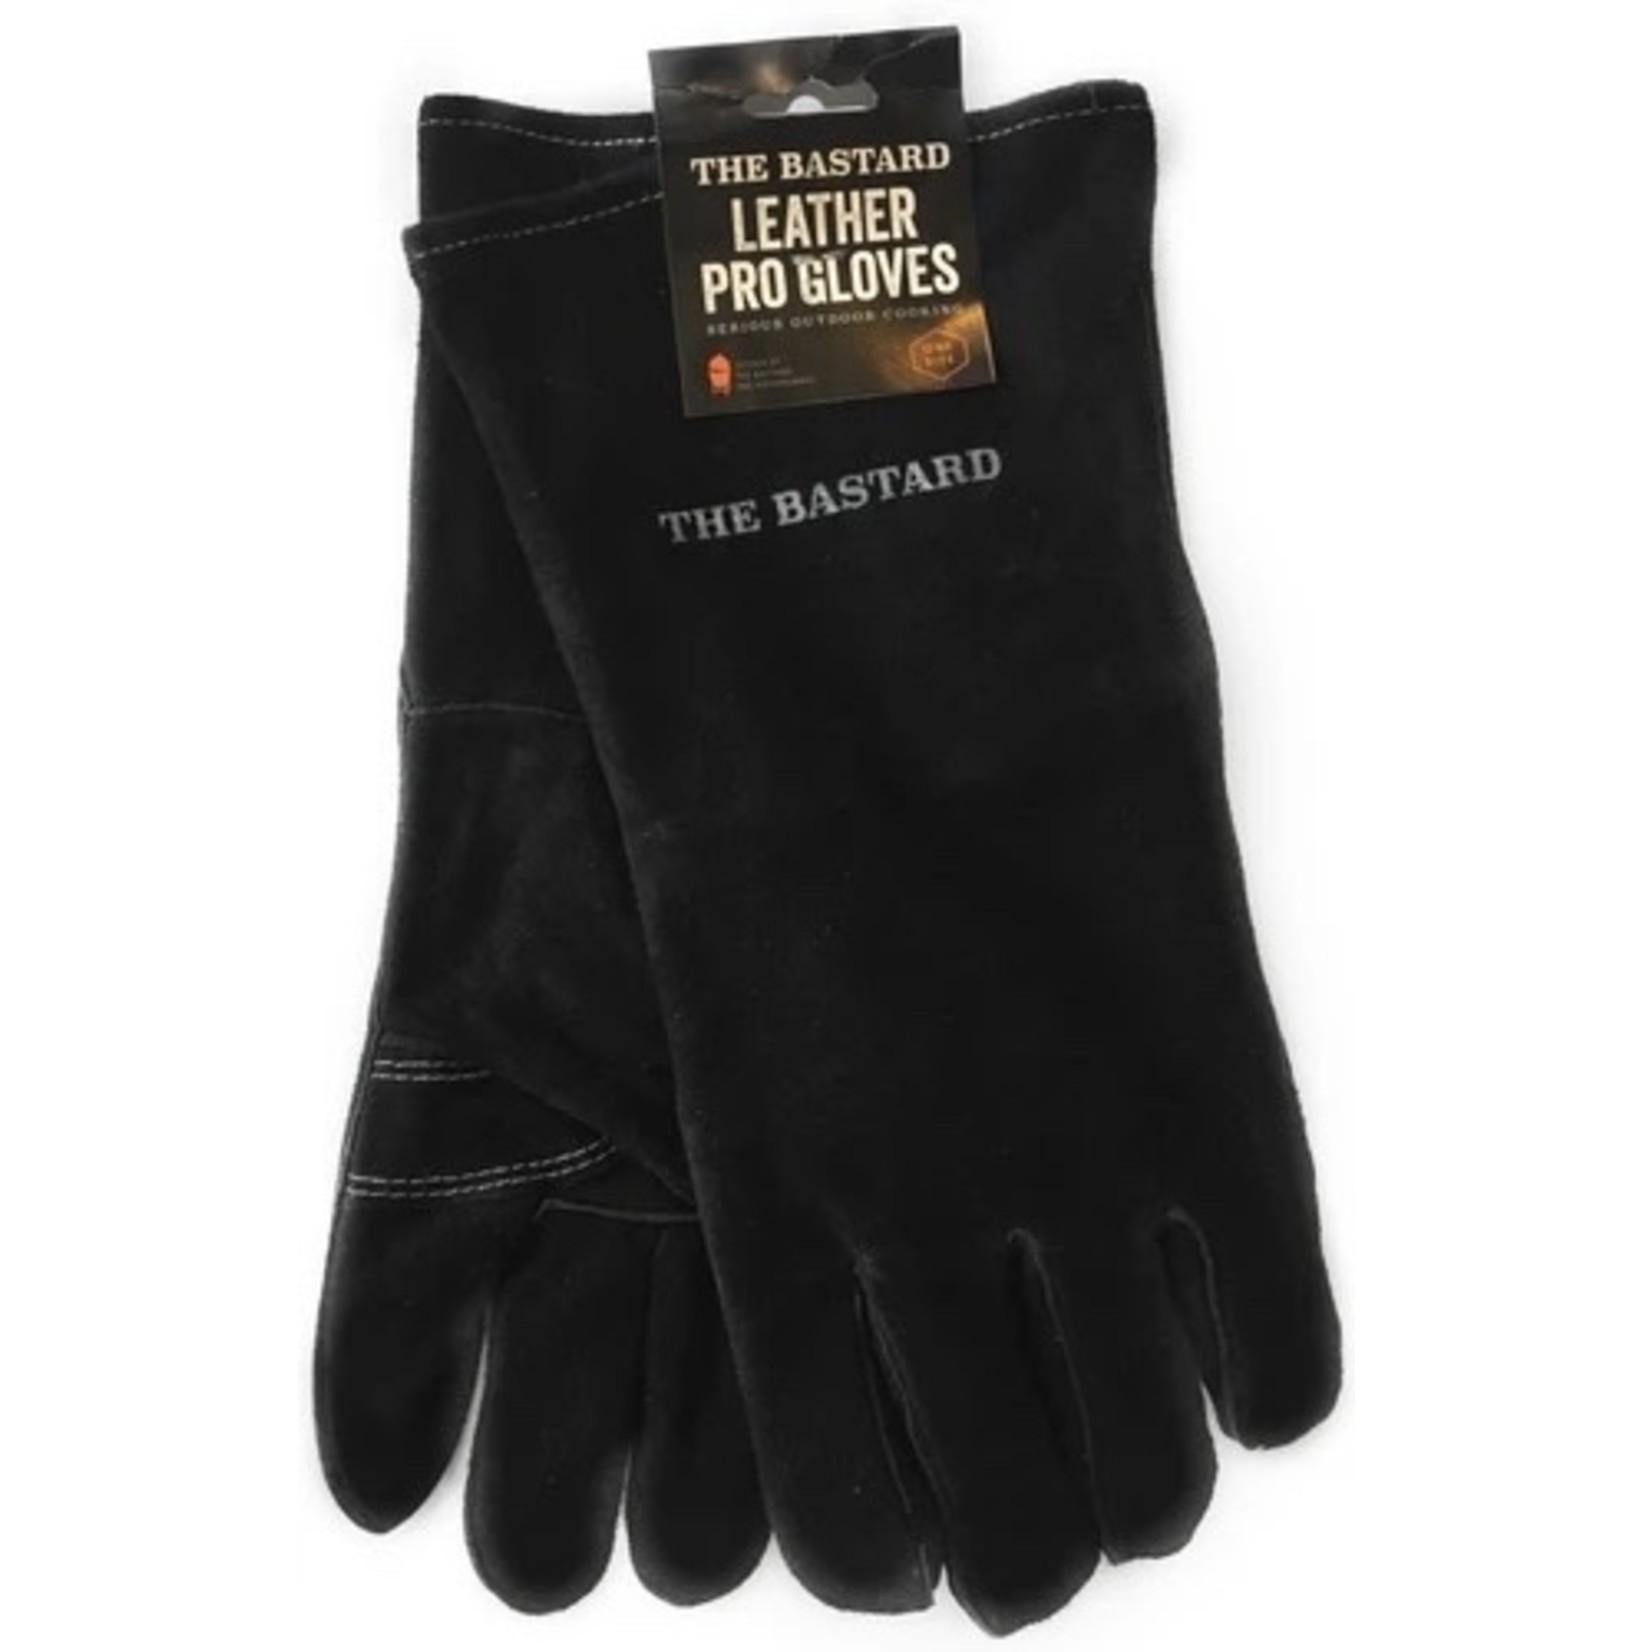 The Bastard The Bastard Leather Pro Gloves